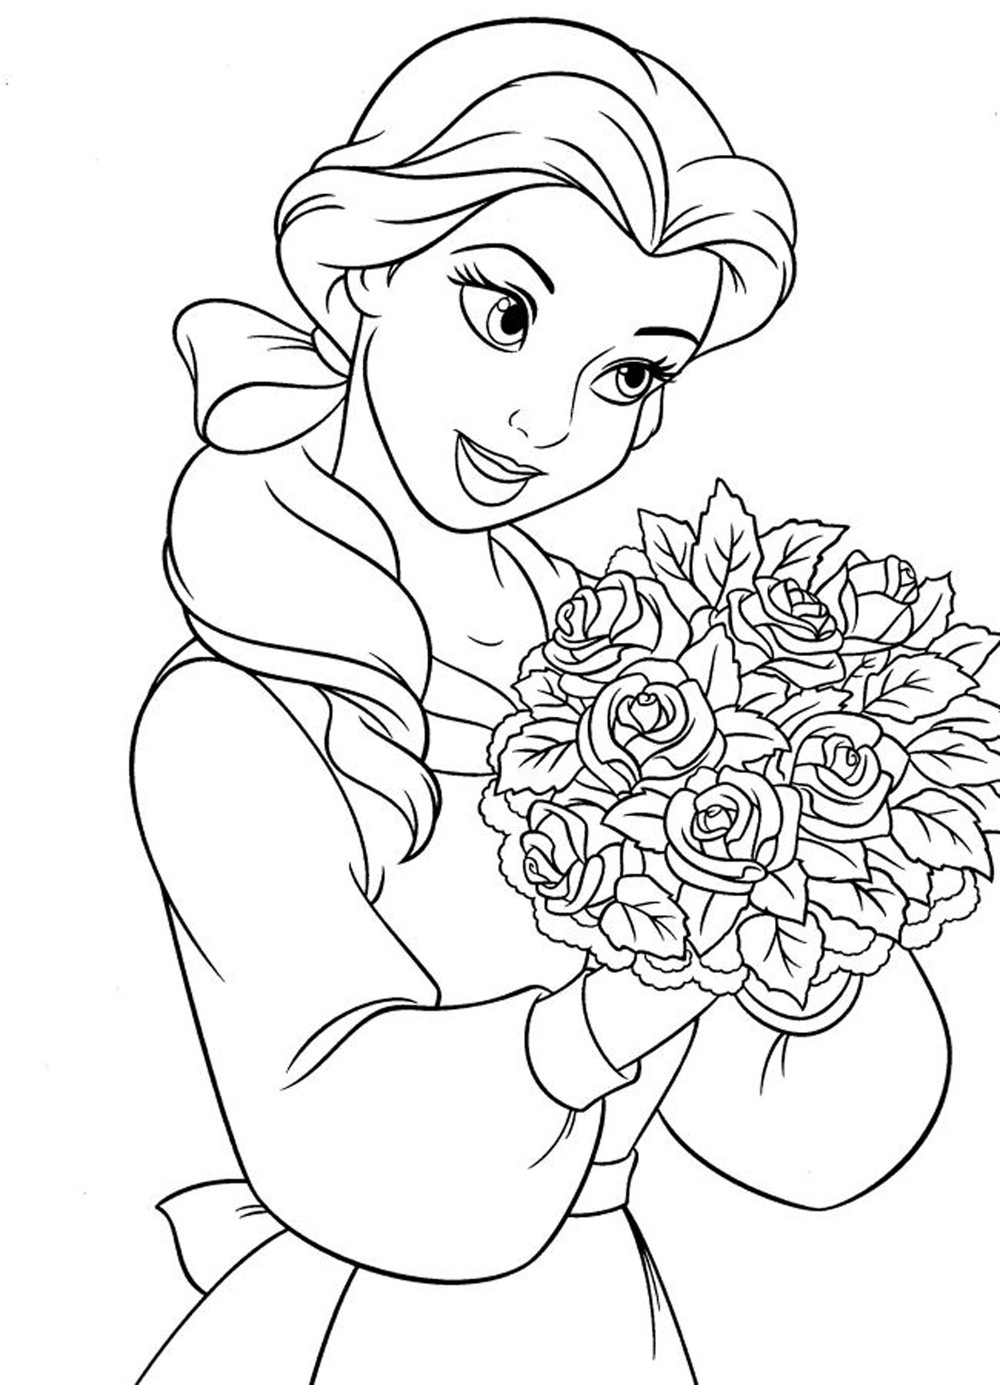 Free Printable Disney Princess Coloring Pages For Kids In 2020 Belle Coloring Pages Disney Princess Coloring Pages Rose Coloring Pages